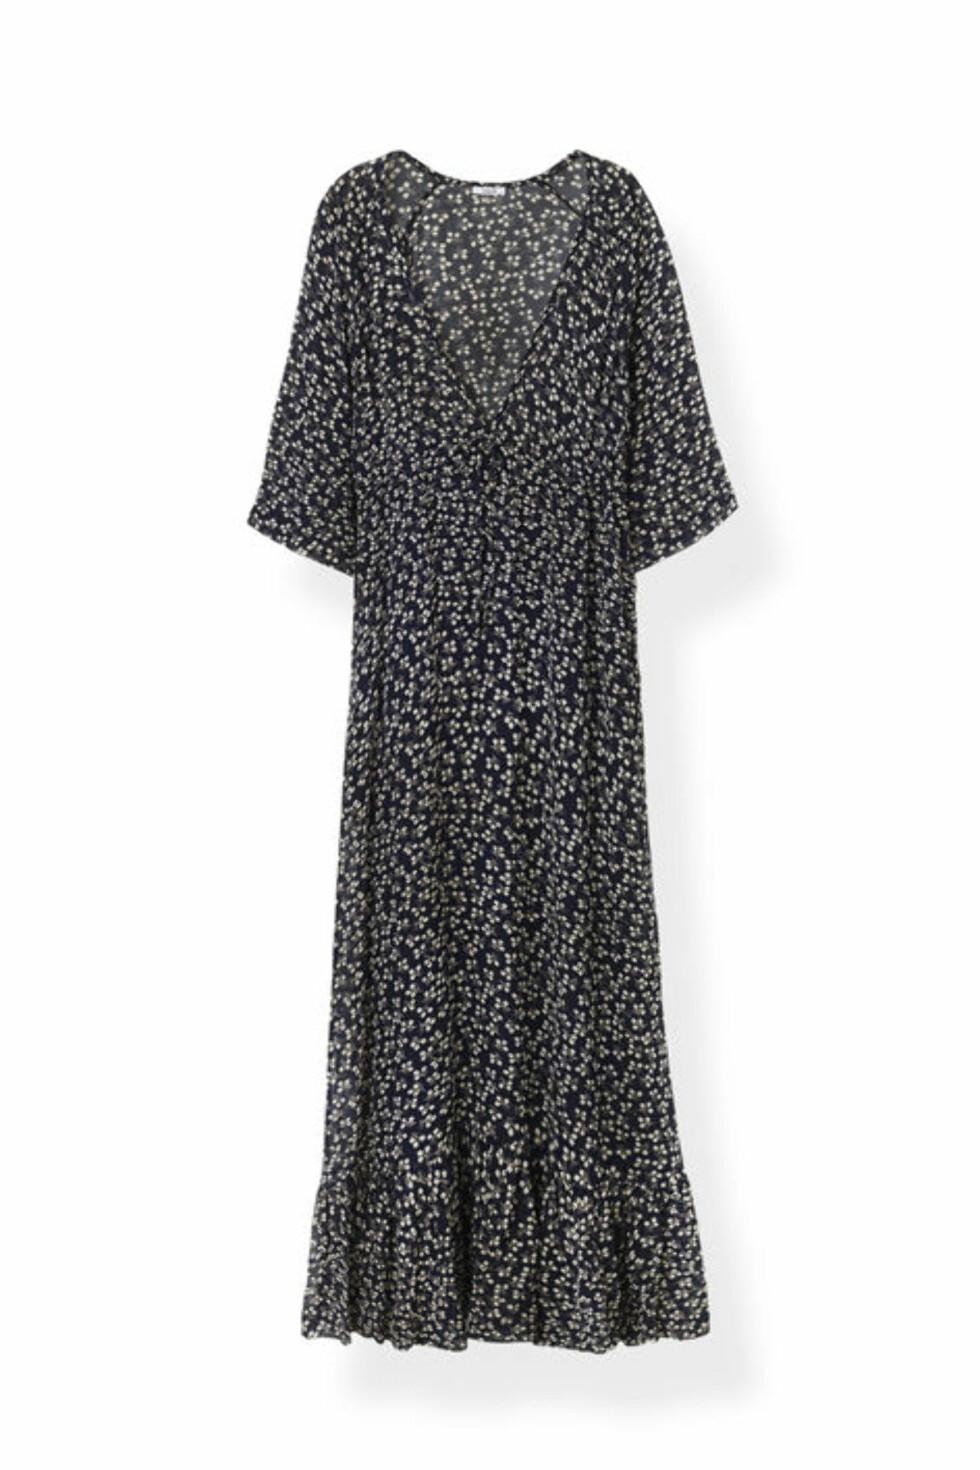 Kjole fra Ganni | kr 1259 | http://www.ganni.com/newman-georgette-maxi-dress/F1660.html?dwvar_F1660_color=Total%20Eclipse